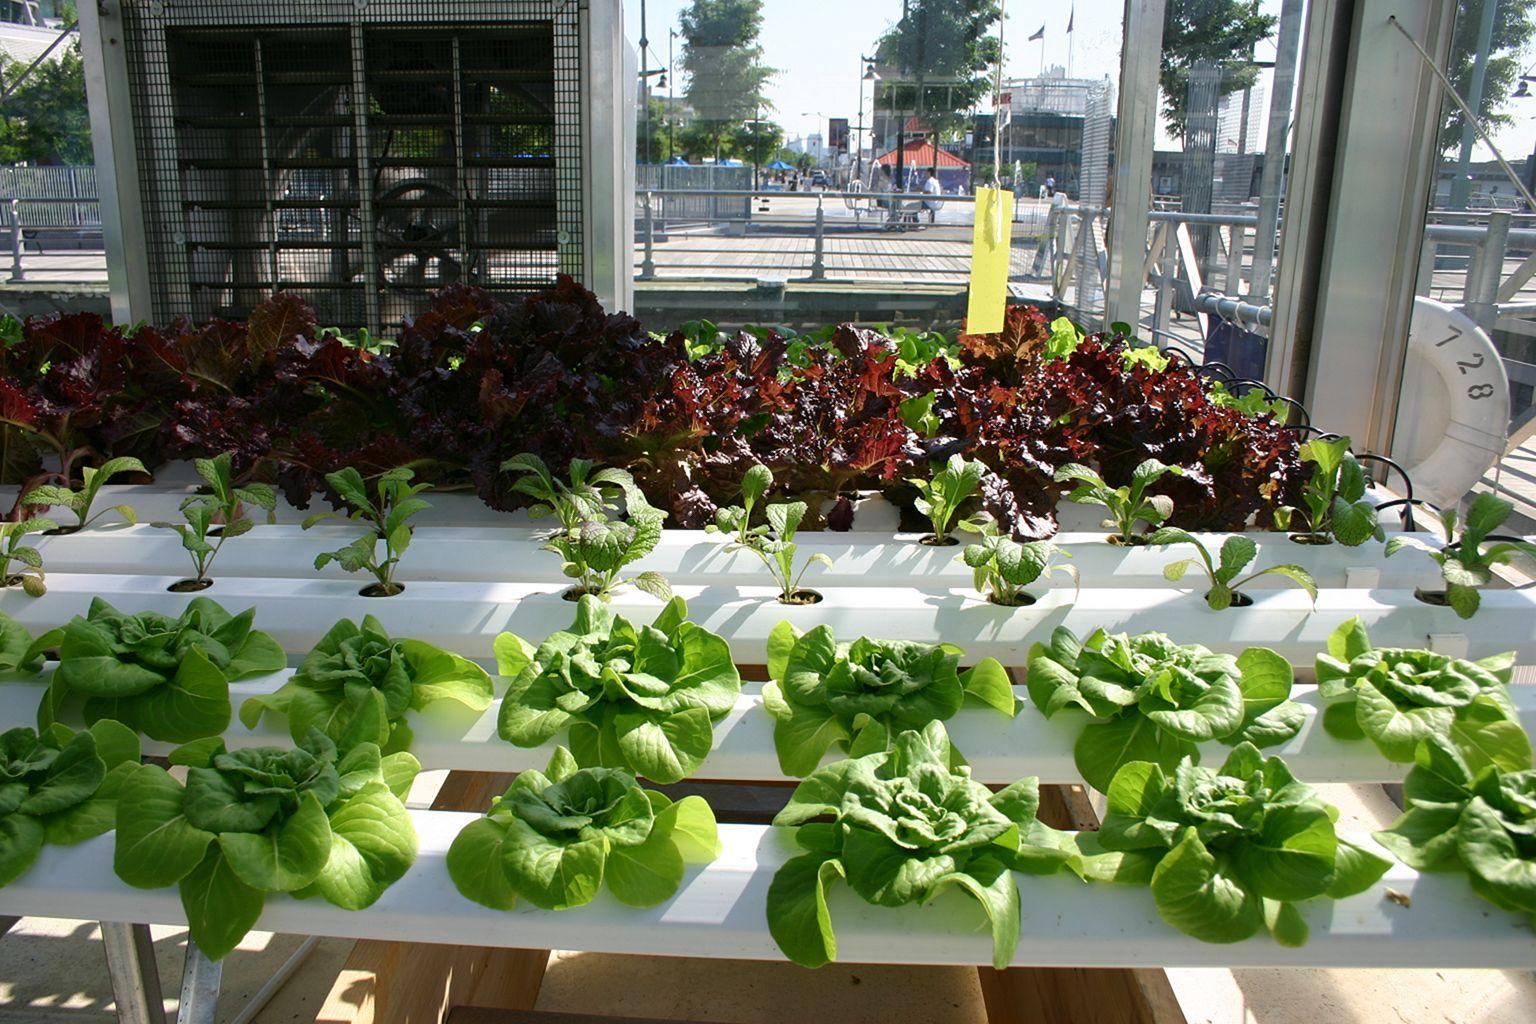 Hydroponic Vegetable Gardens 3